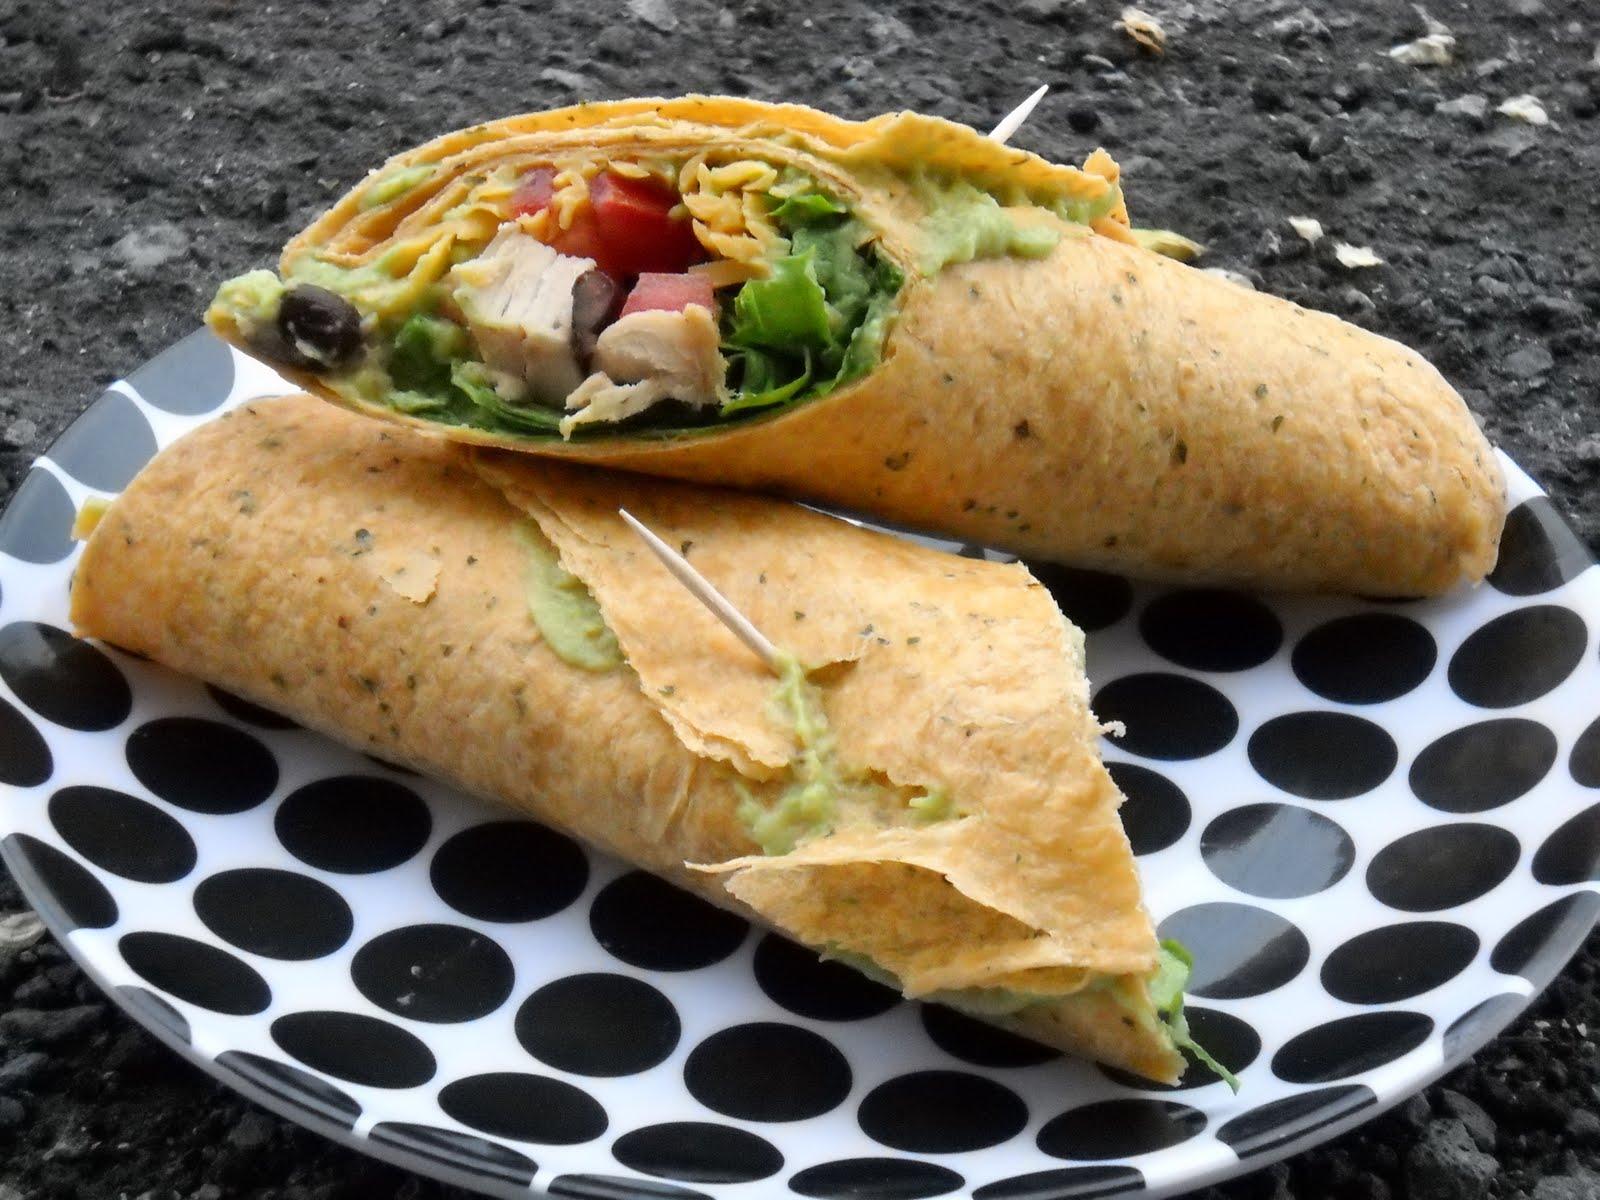 Better Than Burgers: Southwest Wrap